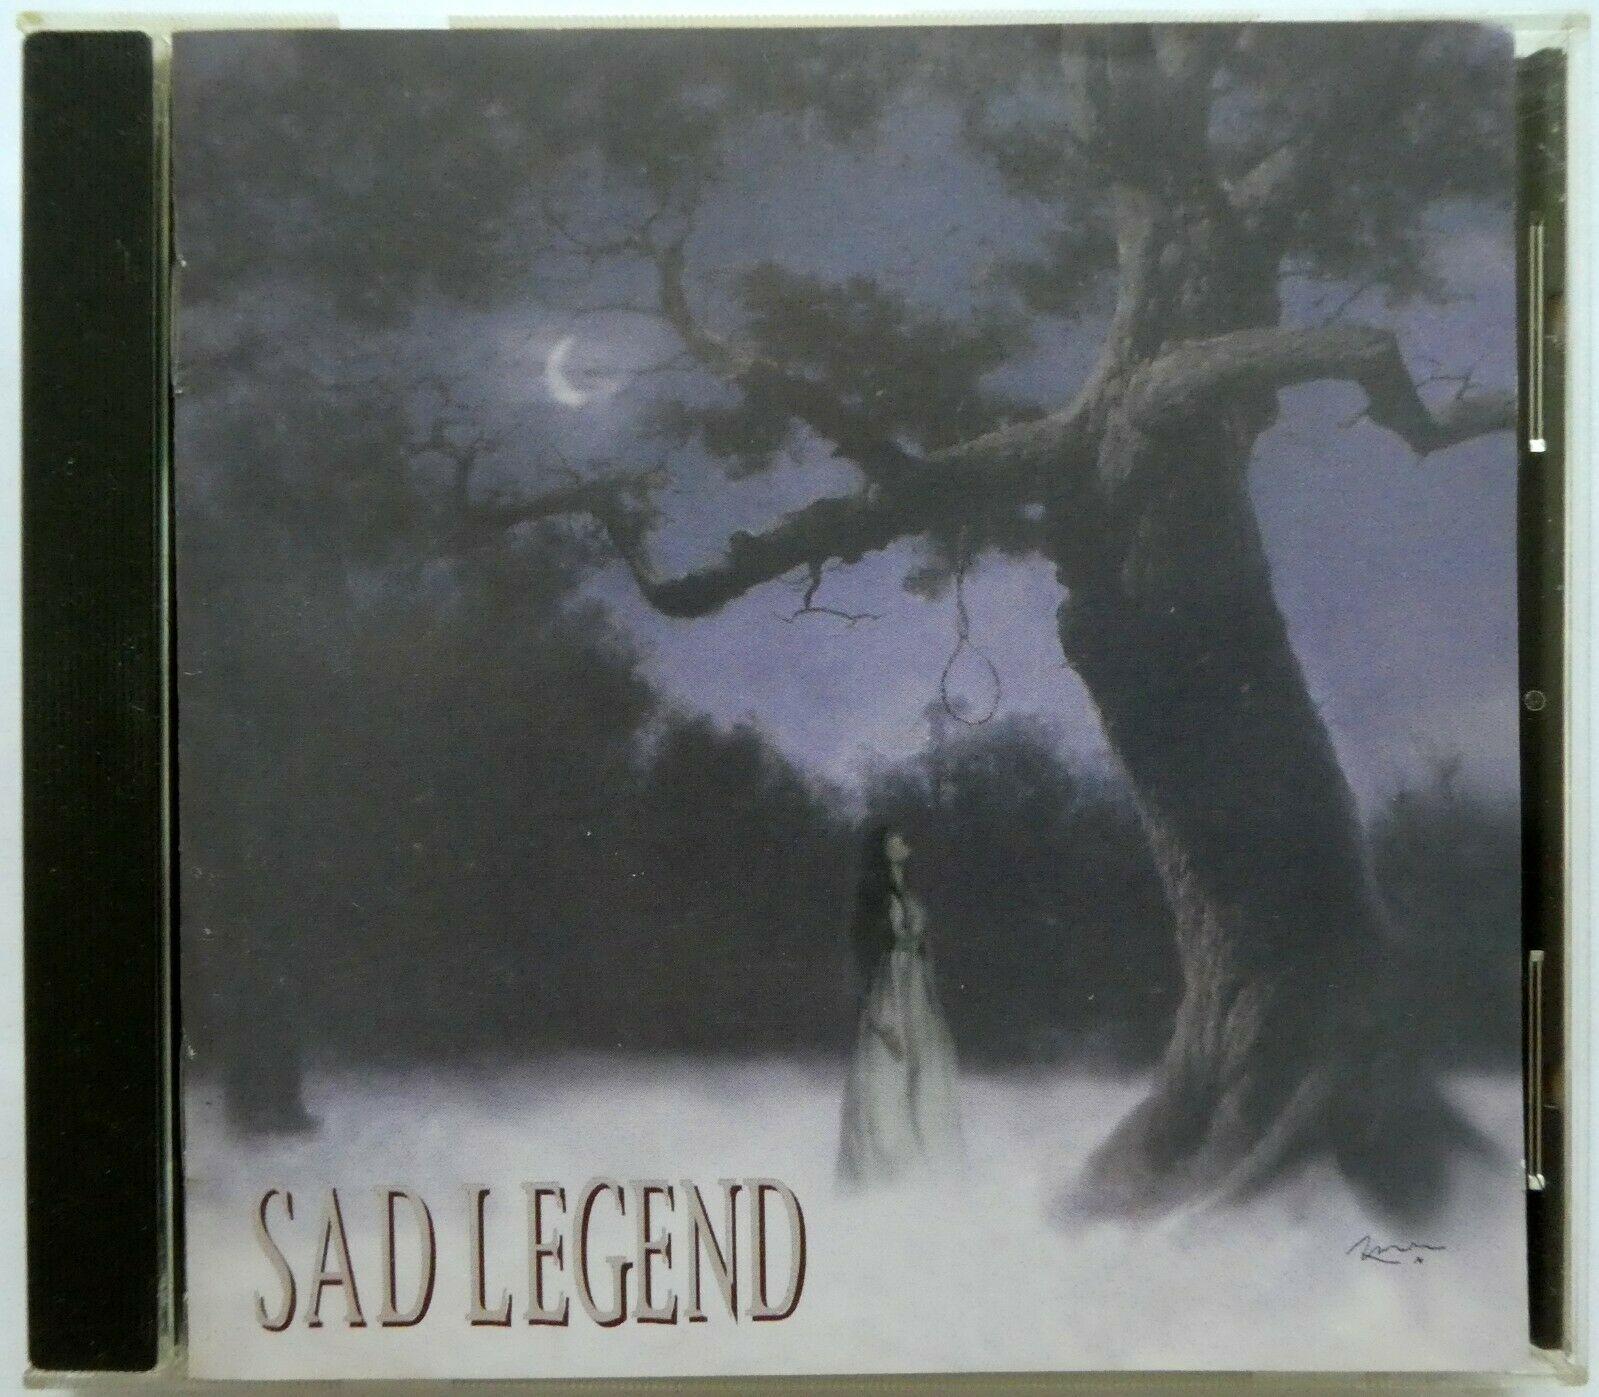 Sad Legend - Self-titled album cover